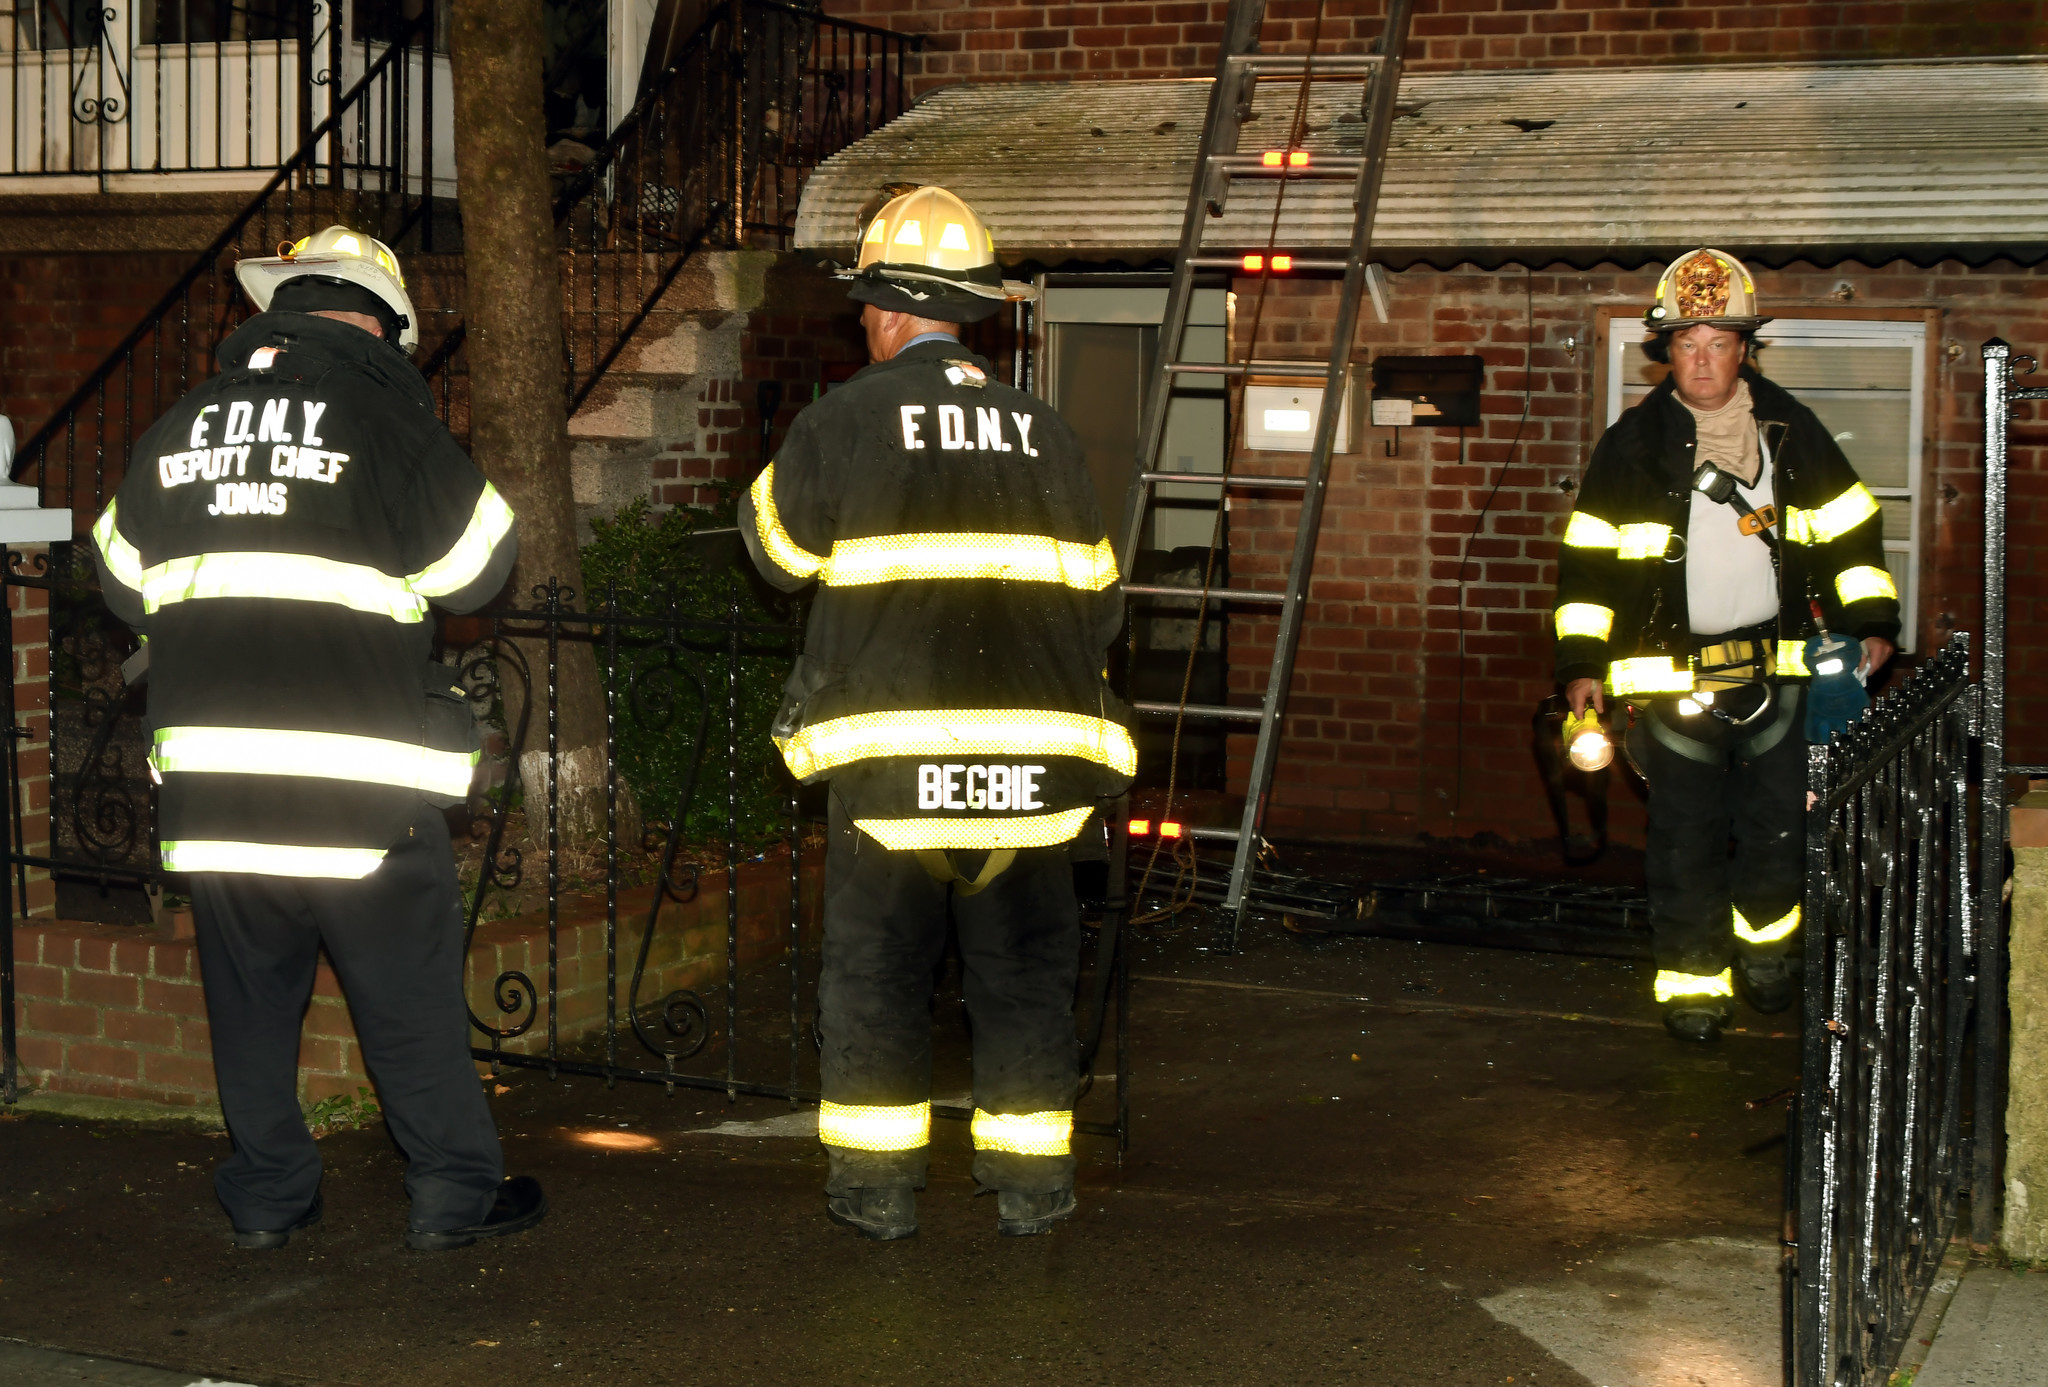 Two people suffer severe burns in raging Bronx blaze